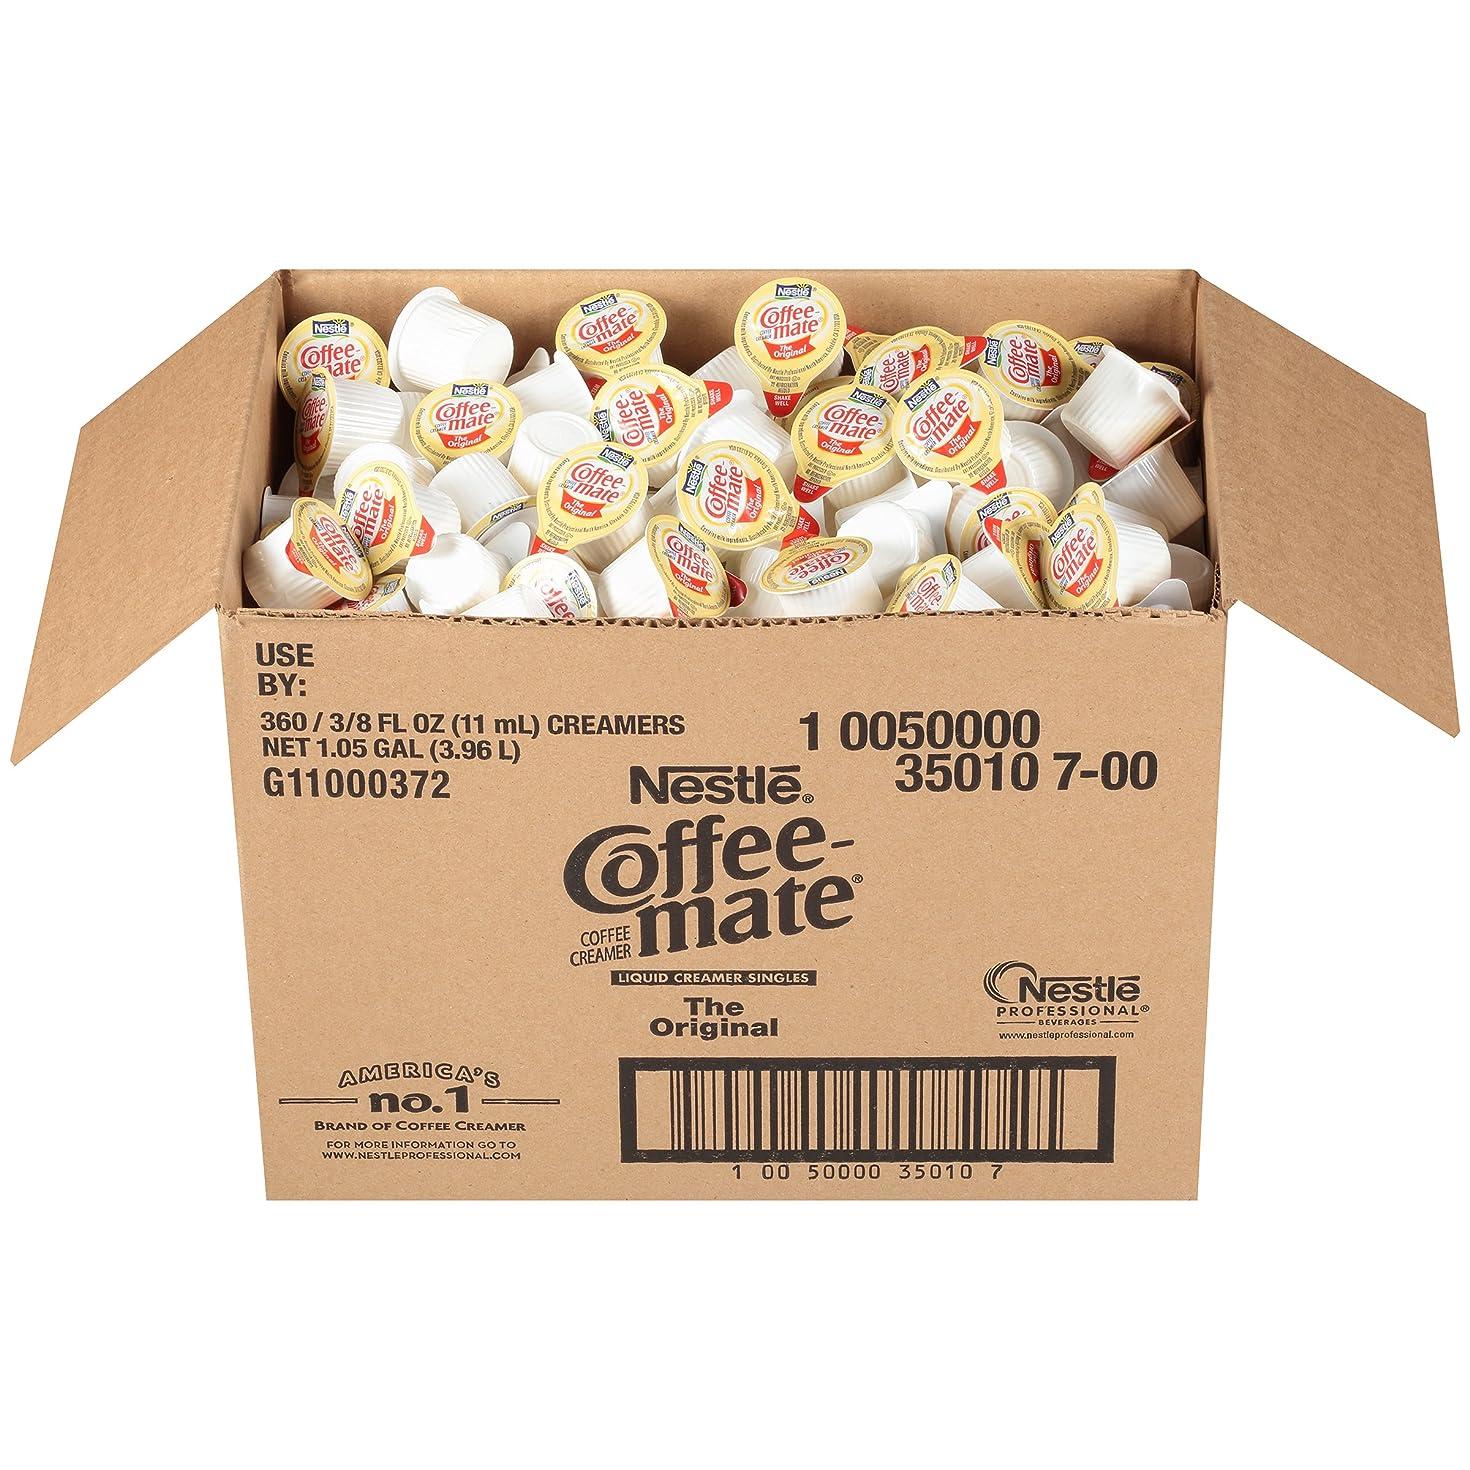 NESTLE COFFEE-MATE Coffee Creamer, Original, liquid creamer singles, Pack of 360